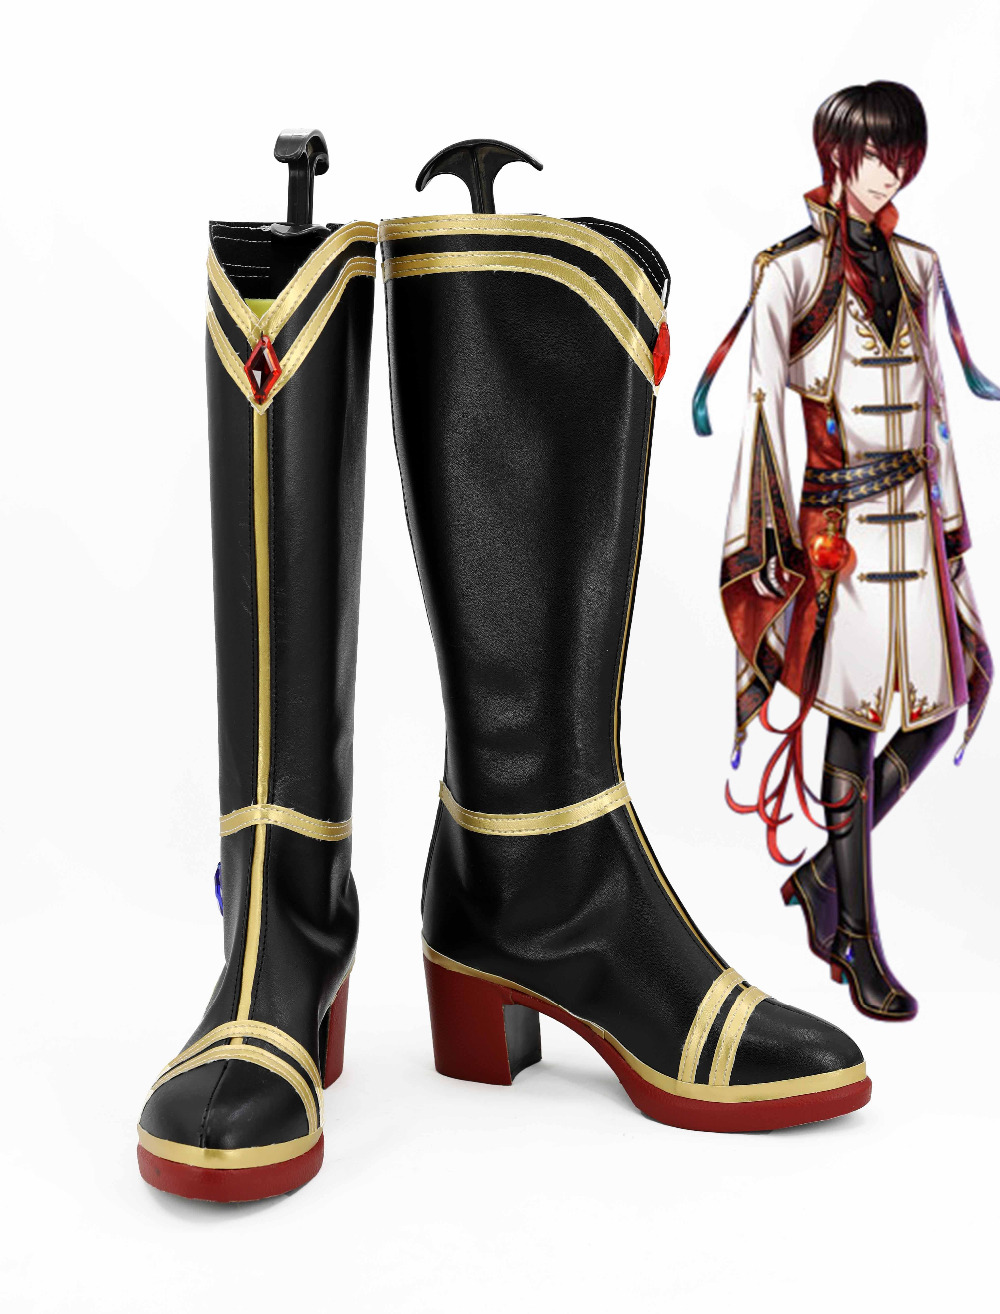 Anime 100 Sleeping Princes & The Kingdom of Dreams Koyasu Takehito Shoes Original Boots Custom Made For Adult Men Women